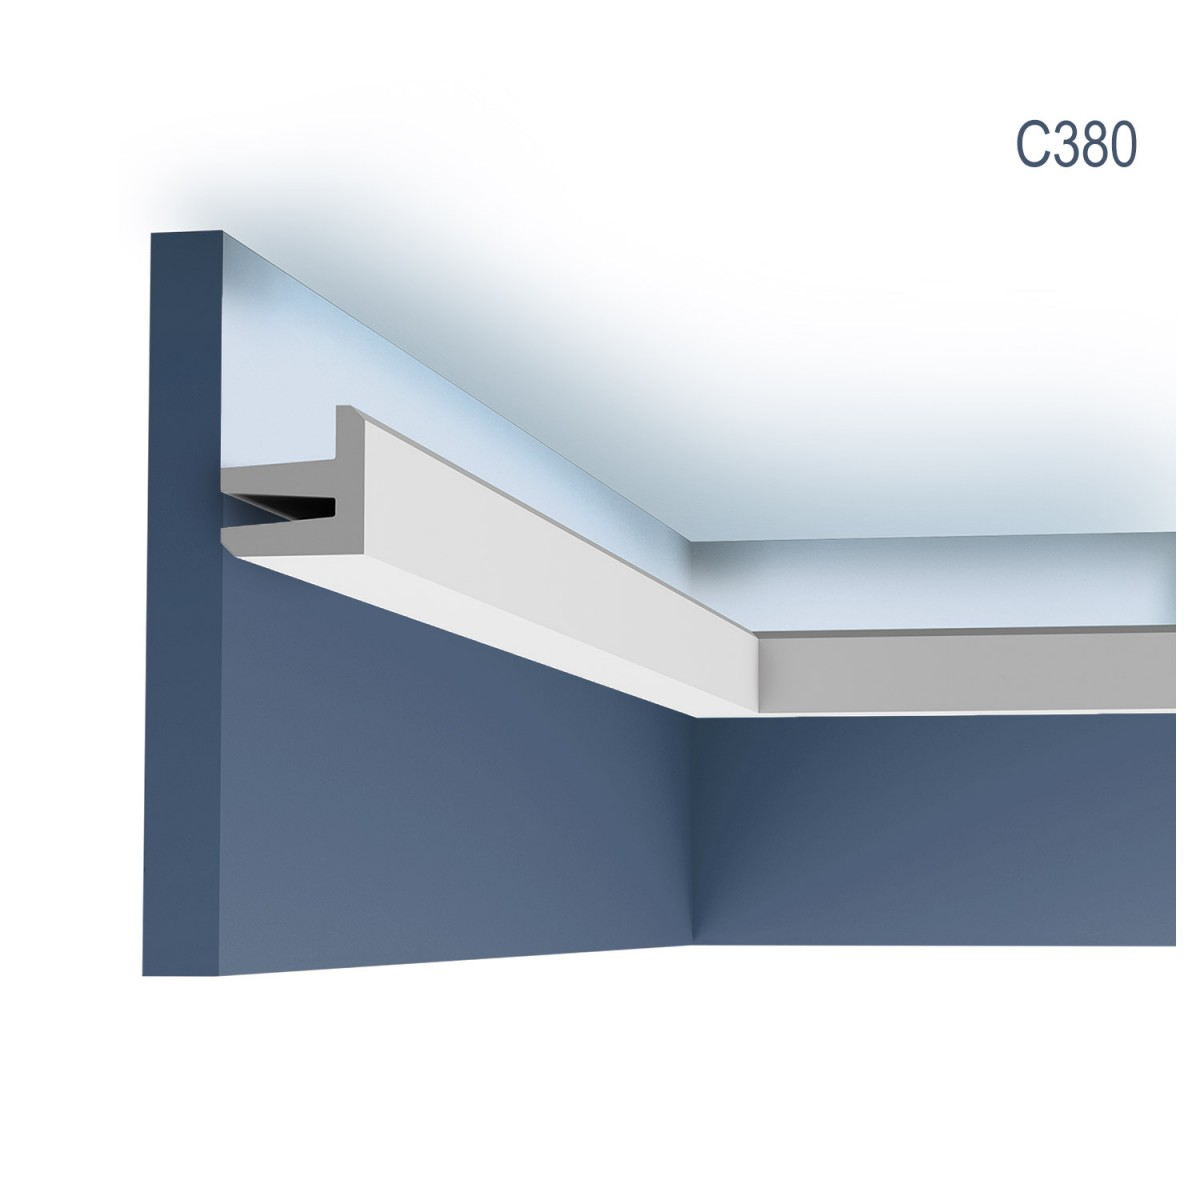 Scafa Modern C380, Dimensiuni: 200 X 5 X 5 cm, Orac Decor